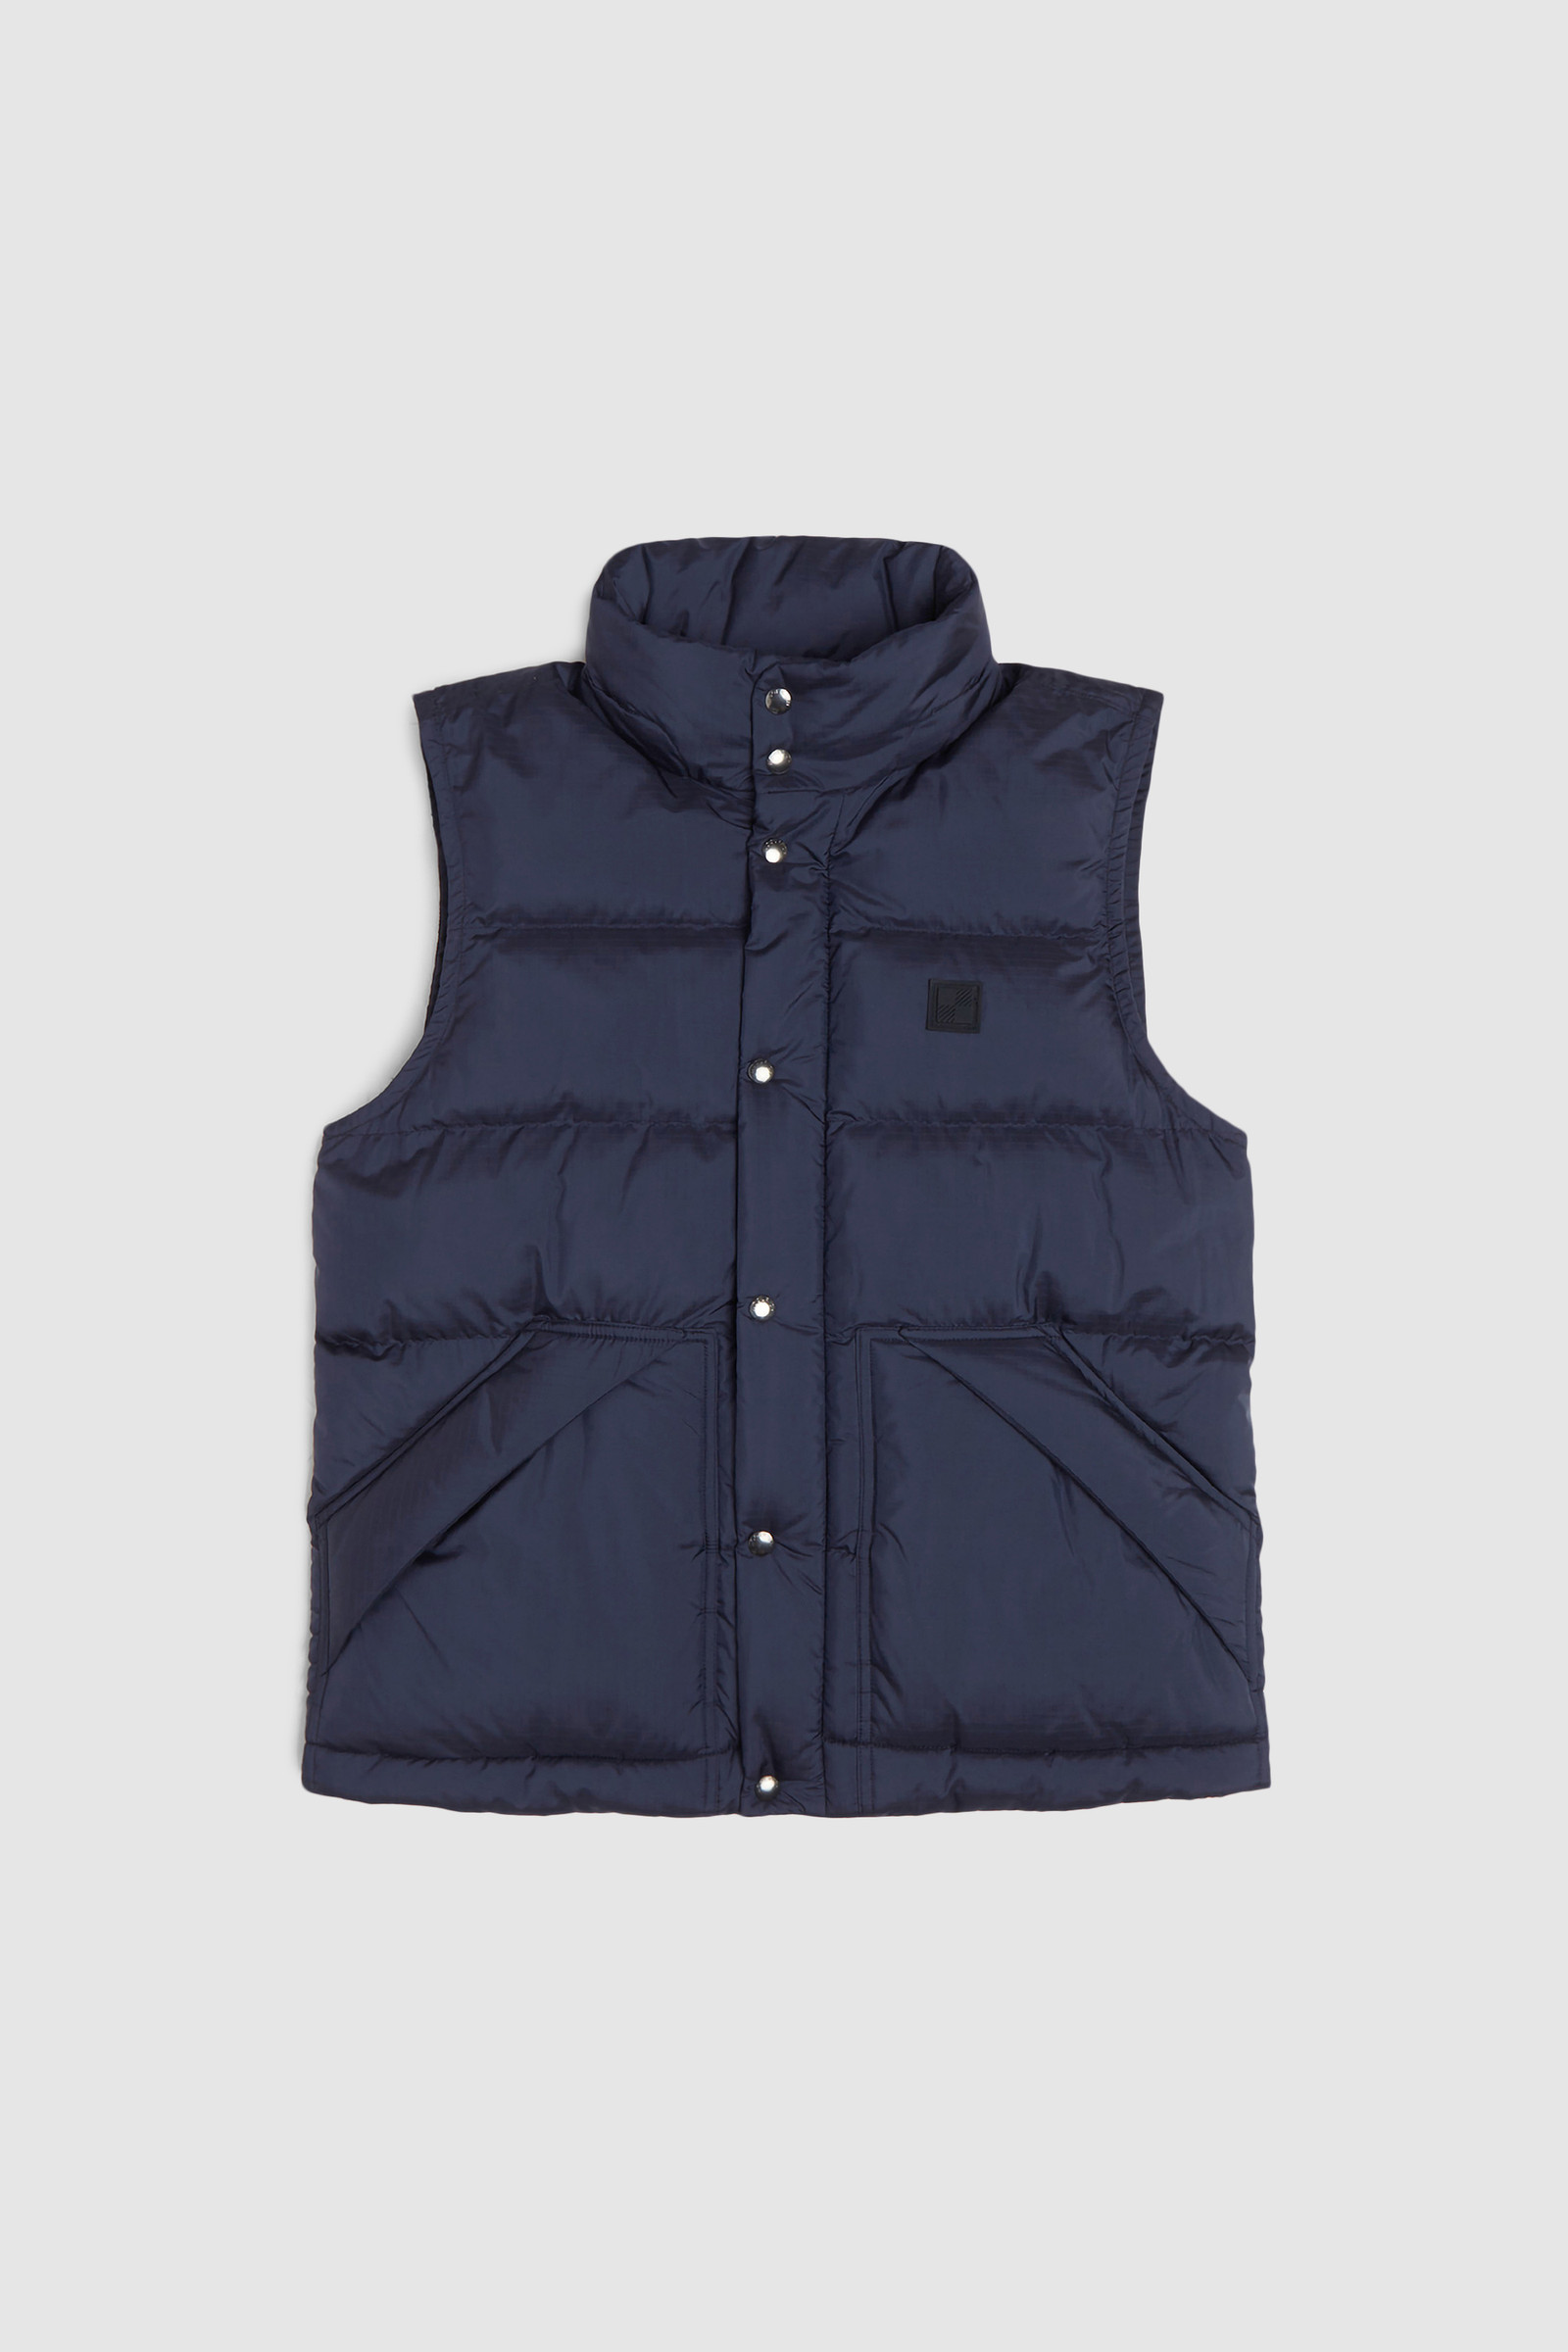 Sierra Supreme Vest